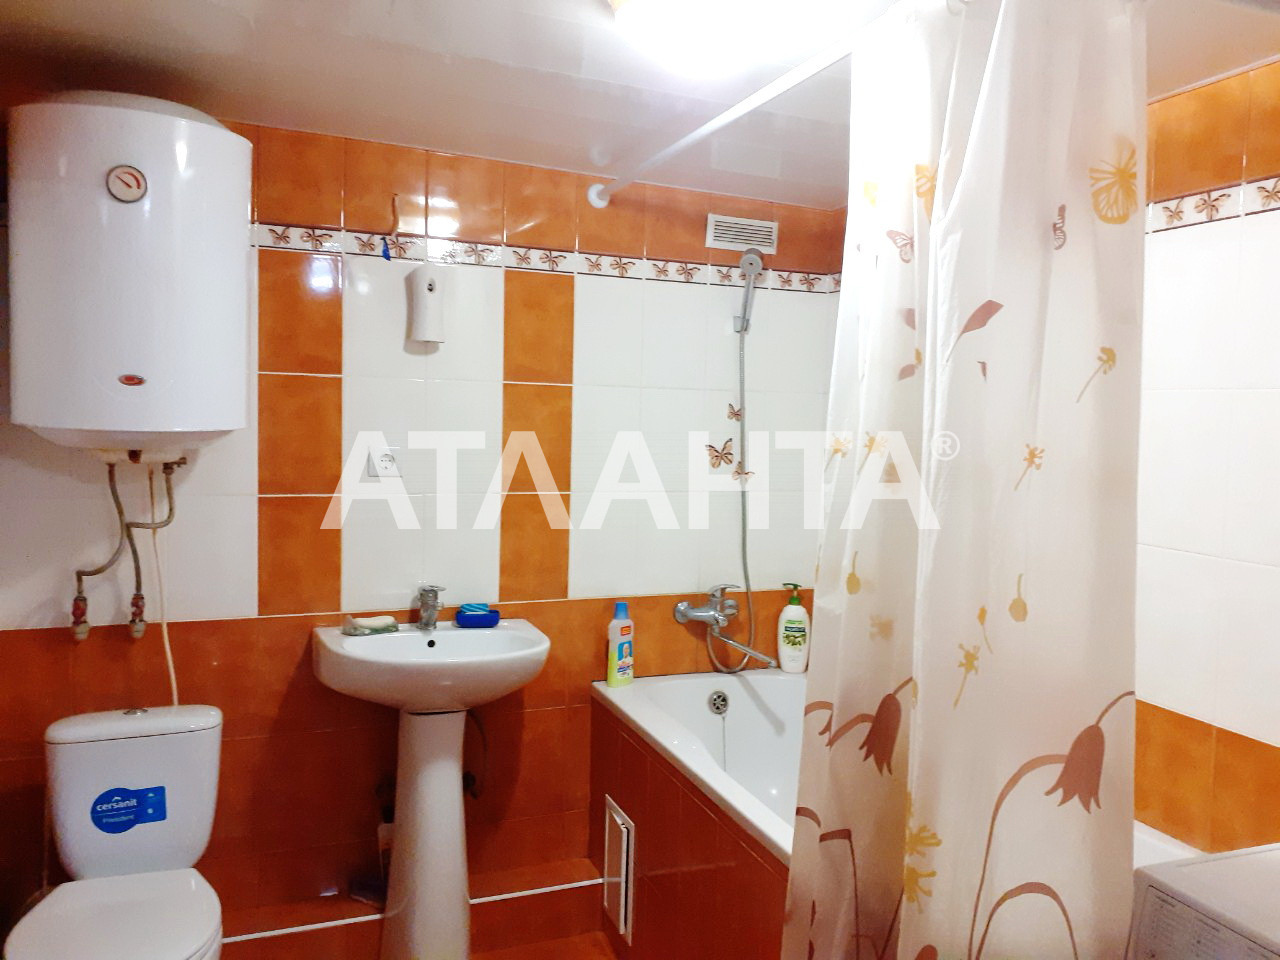 Продается 1-комнатная Квартира на ул. Ядова Сергея (Юбилейная) — 35 000 у.е. (фото №7)